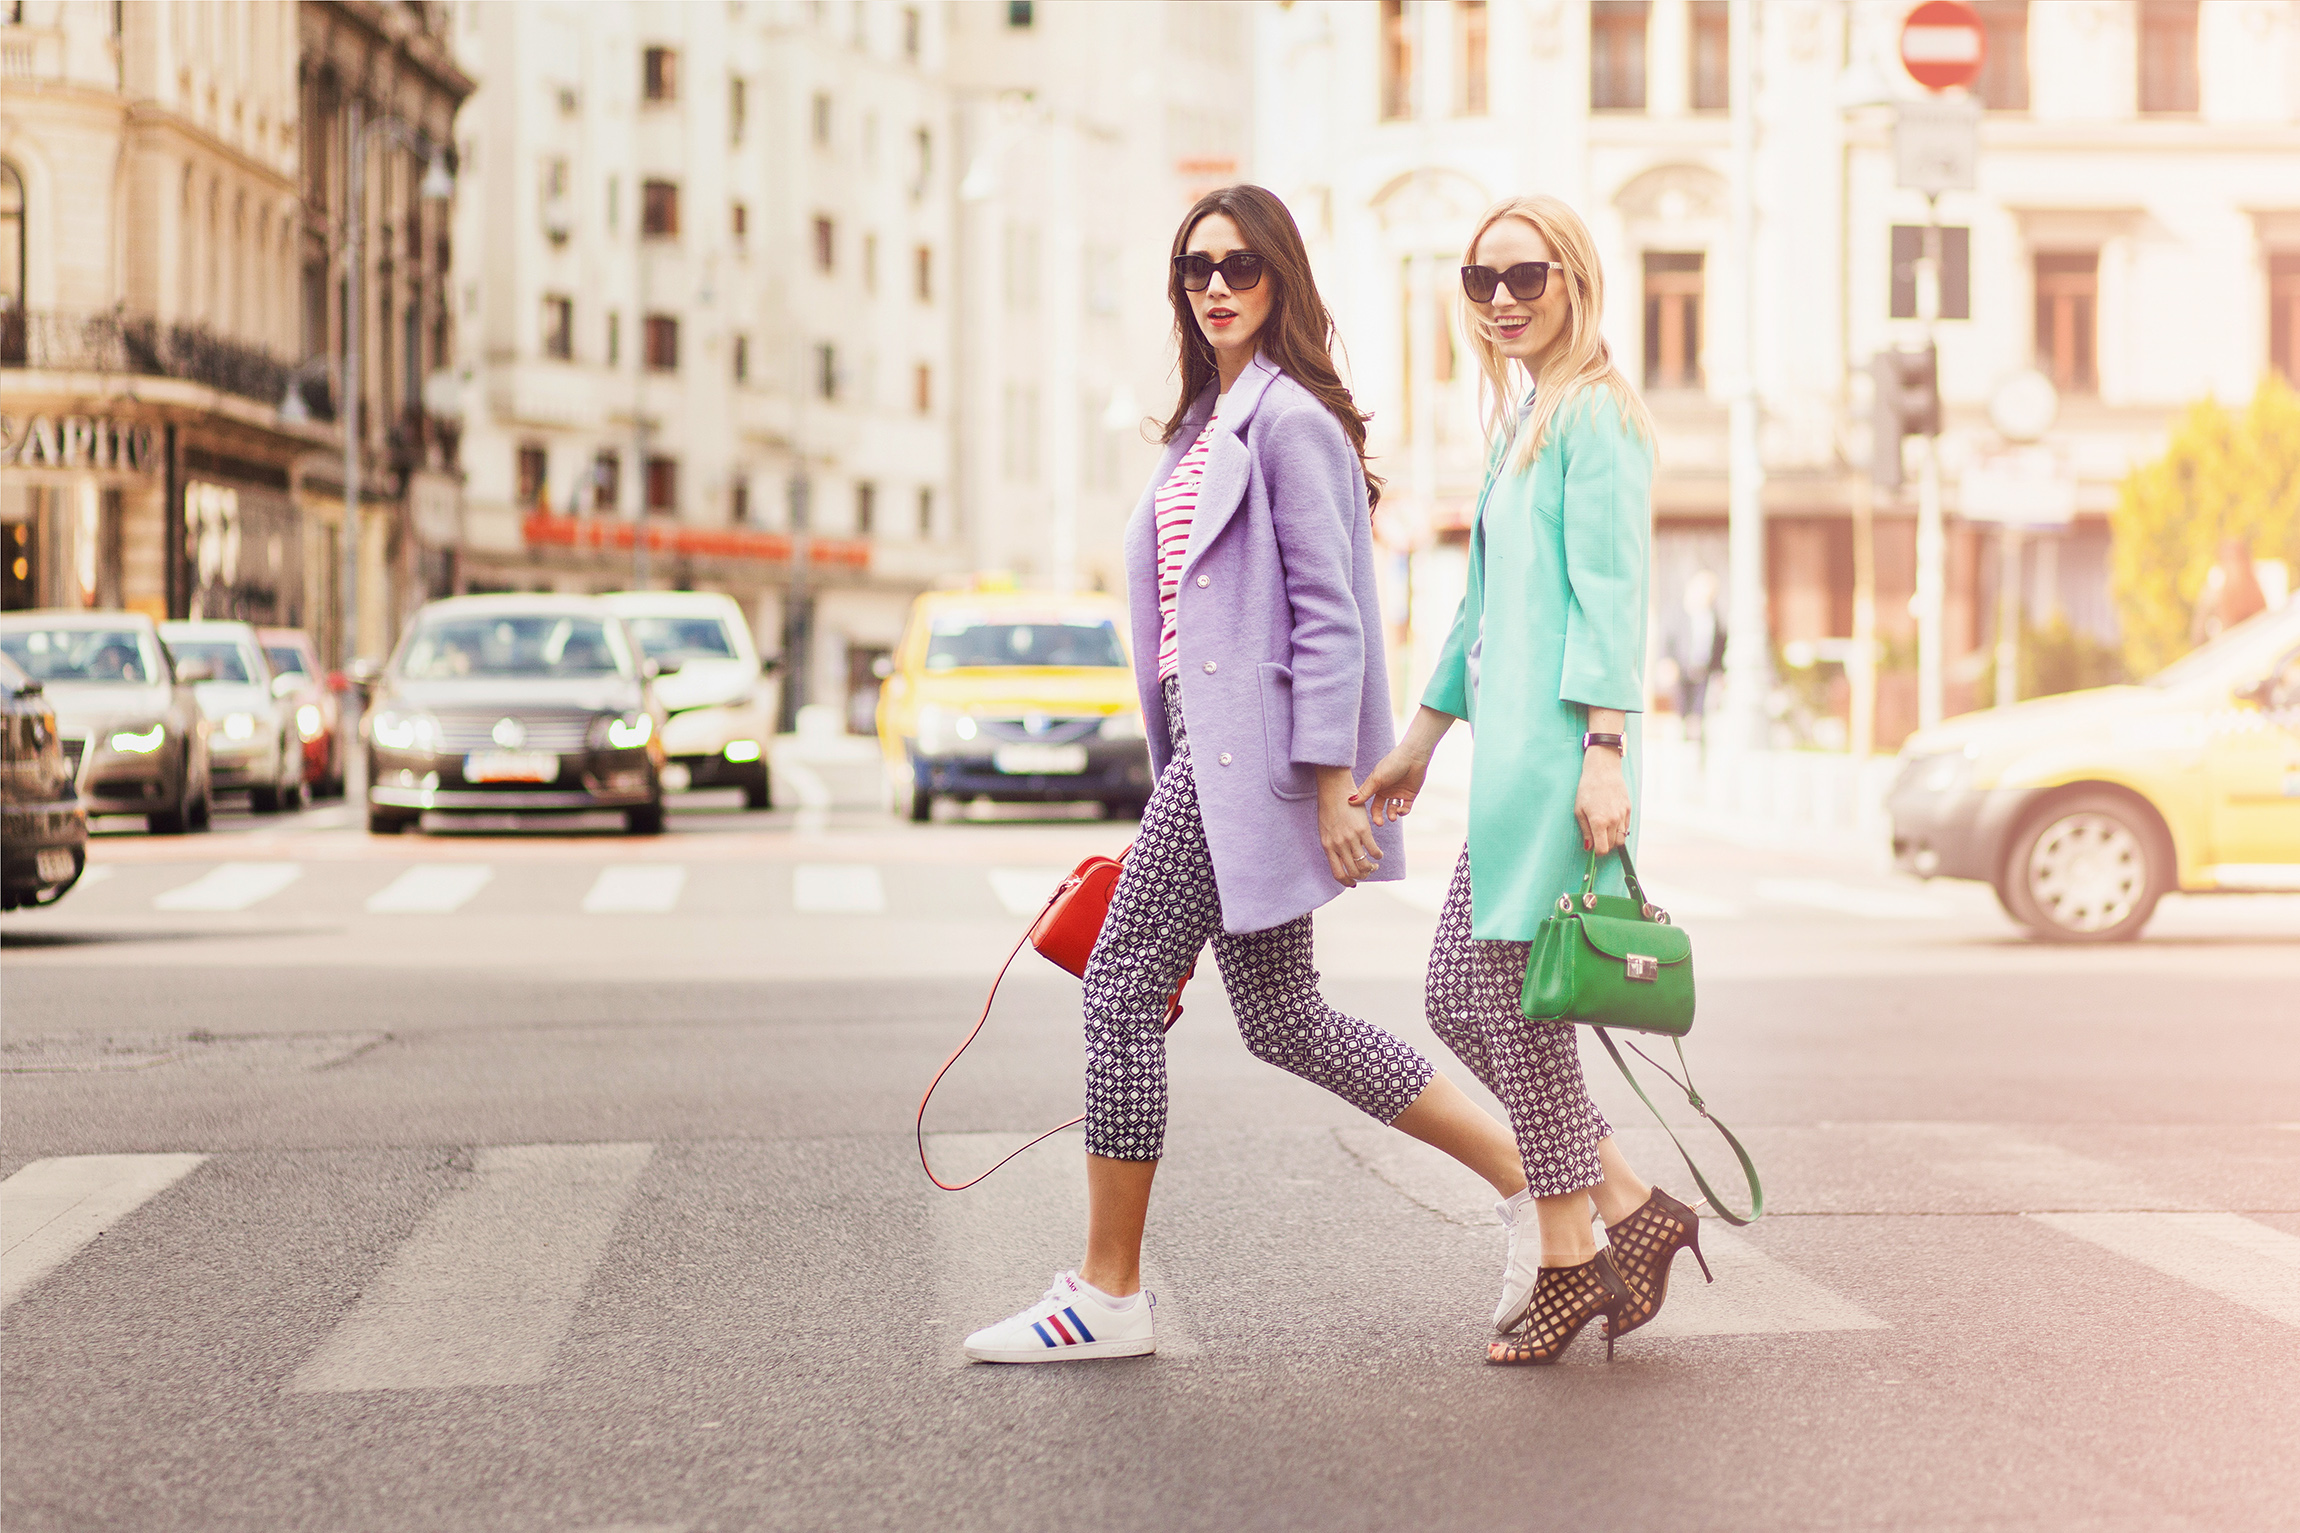 debenhams romania_debenhams collection_fabulous muses_diana enciu_alina tanasa_ ss 2015 trends_stripes top_pattern trends (9)